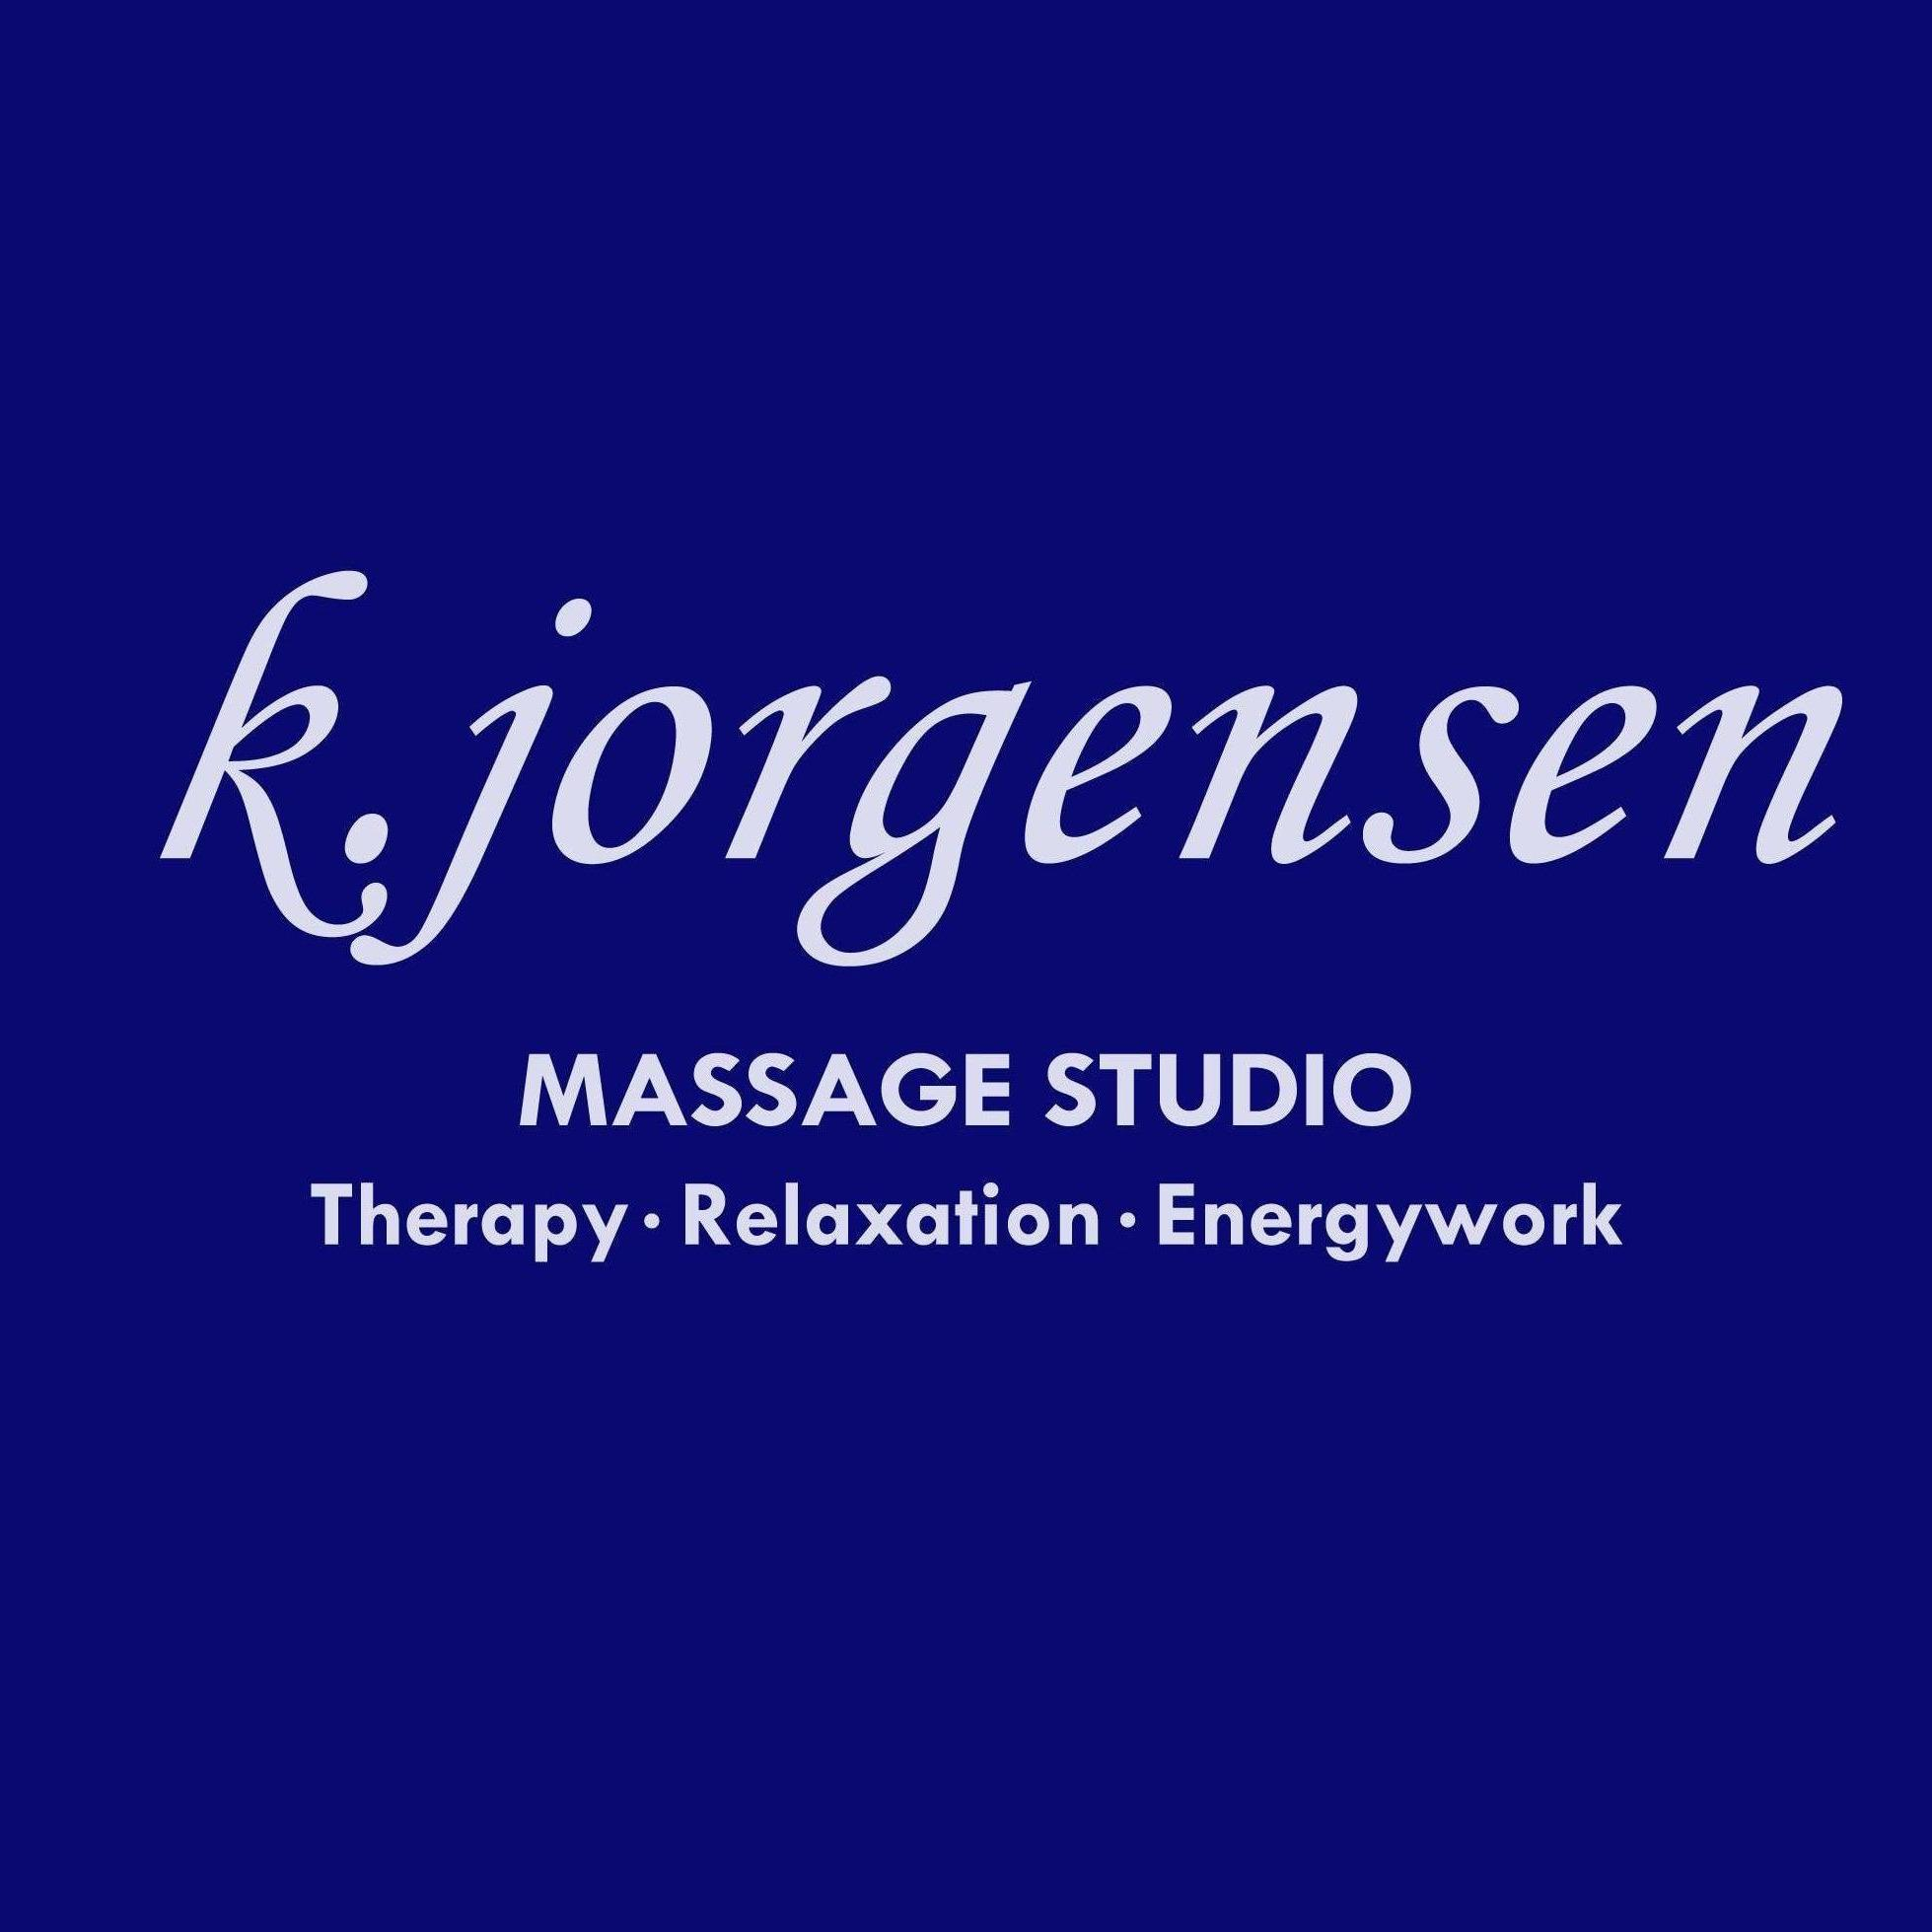 Kjorgensen Massage Studio